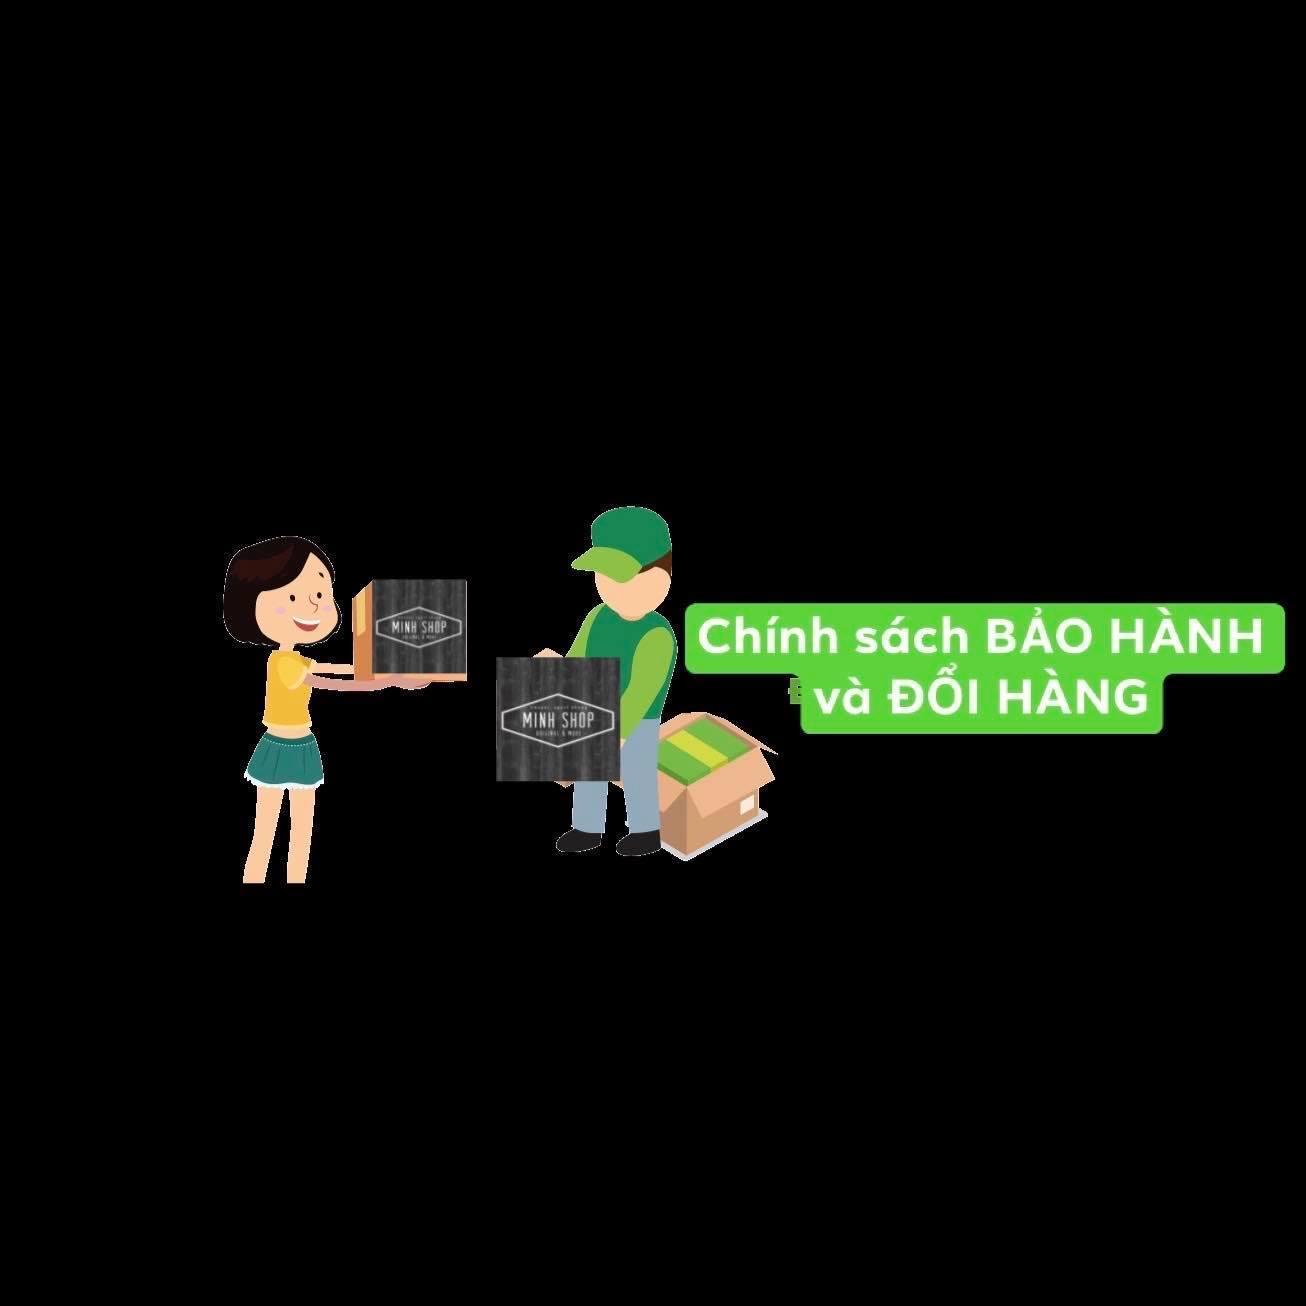 chinh-sach-bao-hanh-va-doi-hang-tai-minhshop-vn